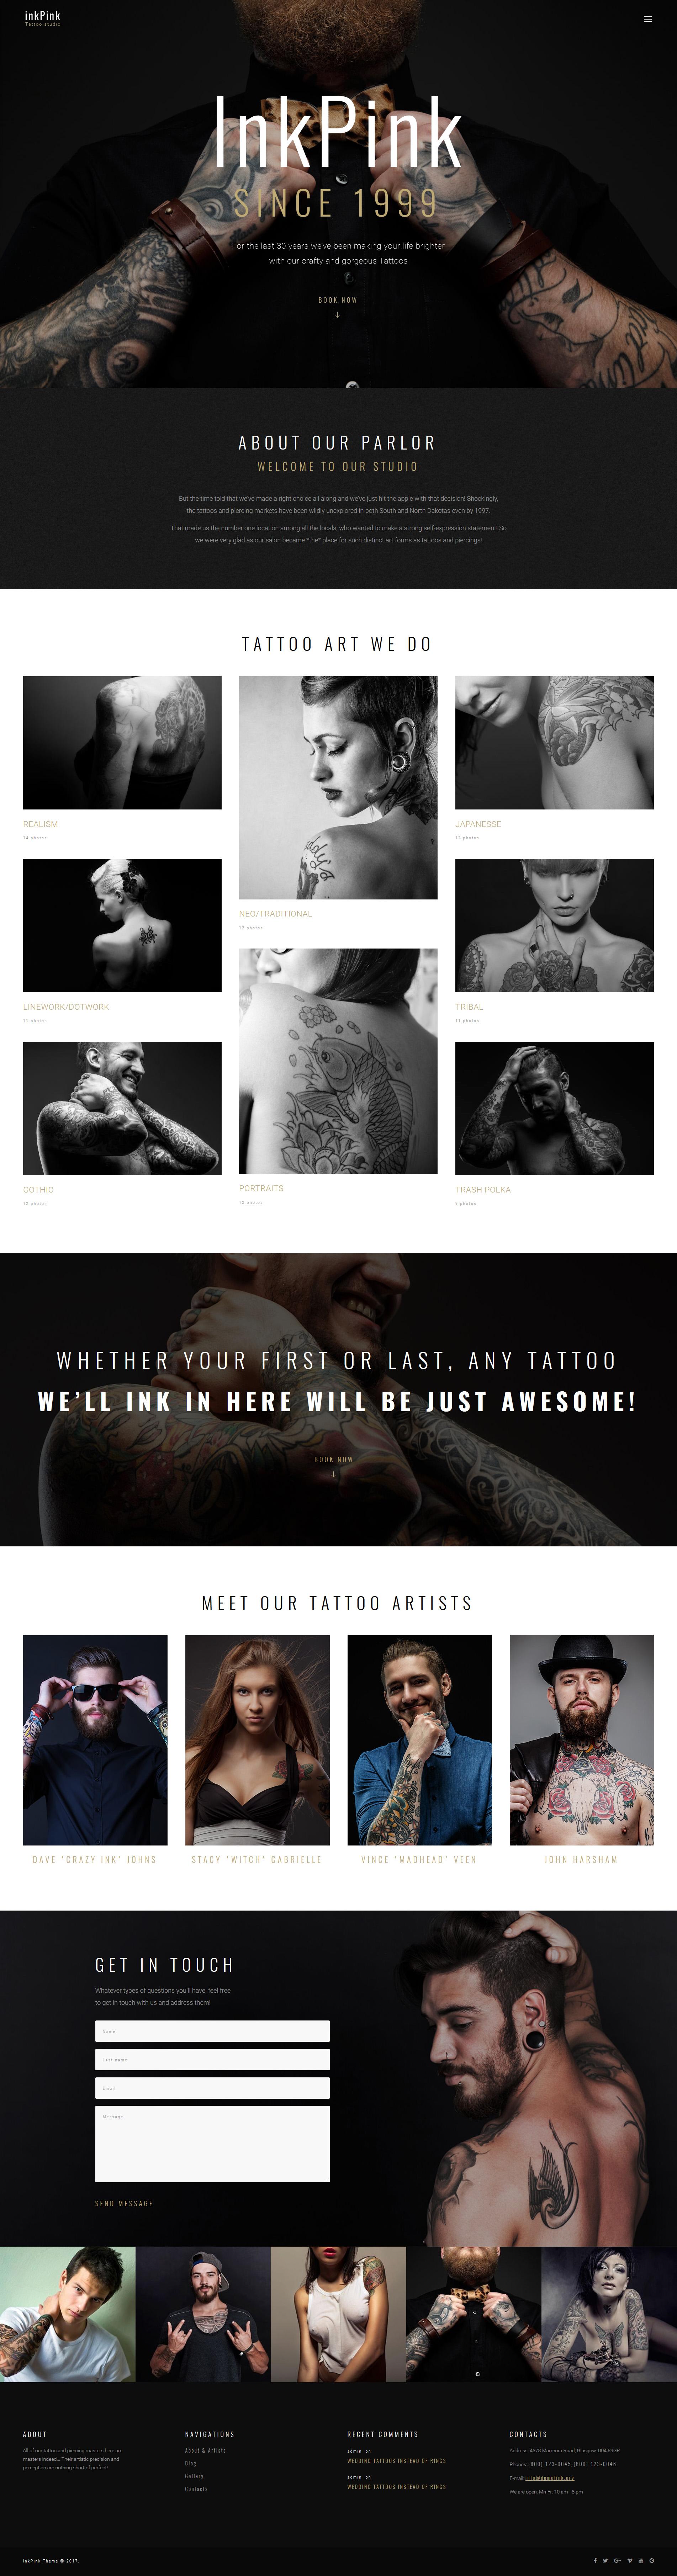 """InkPink - Tattoo Studio"" 响应式WordPress模板 #63591"